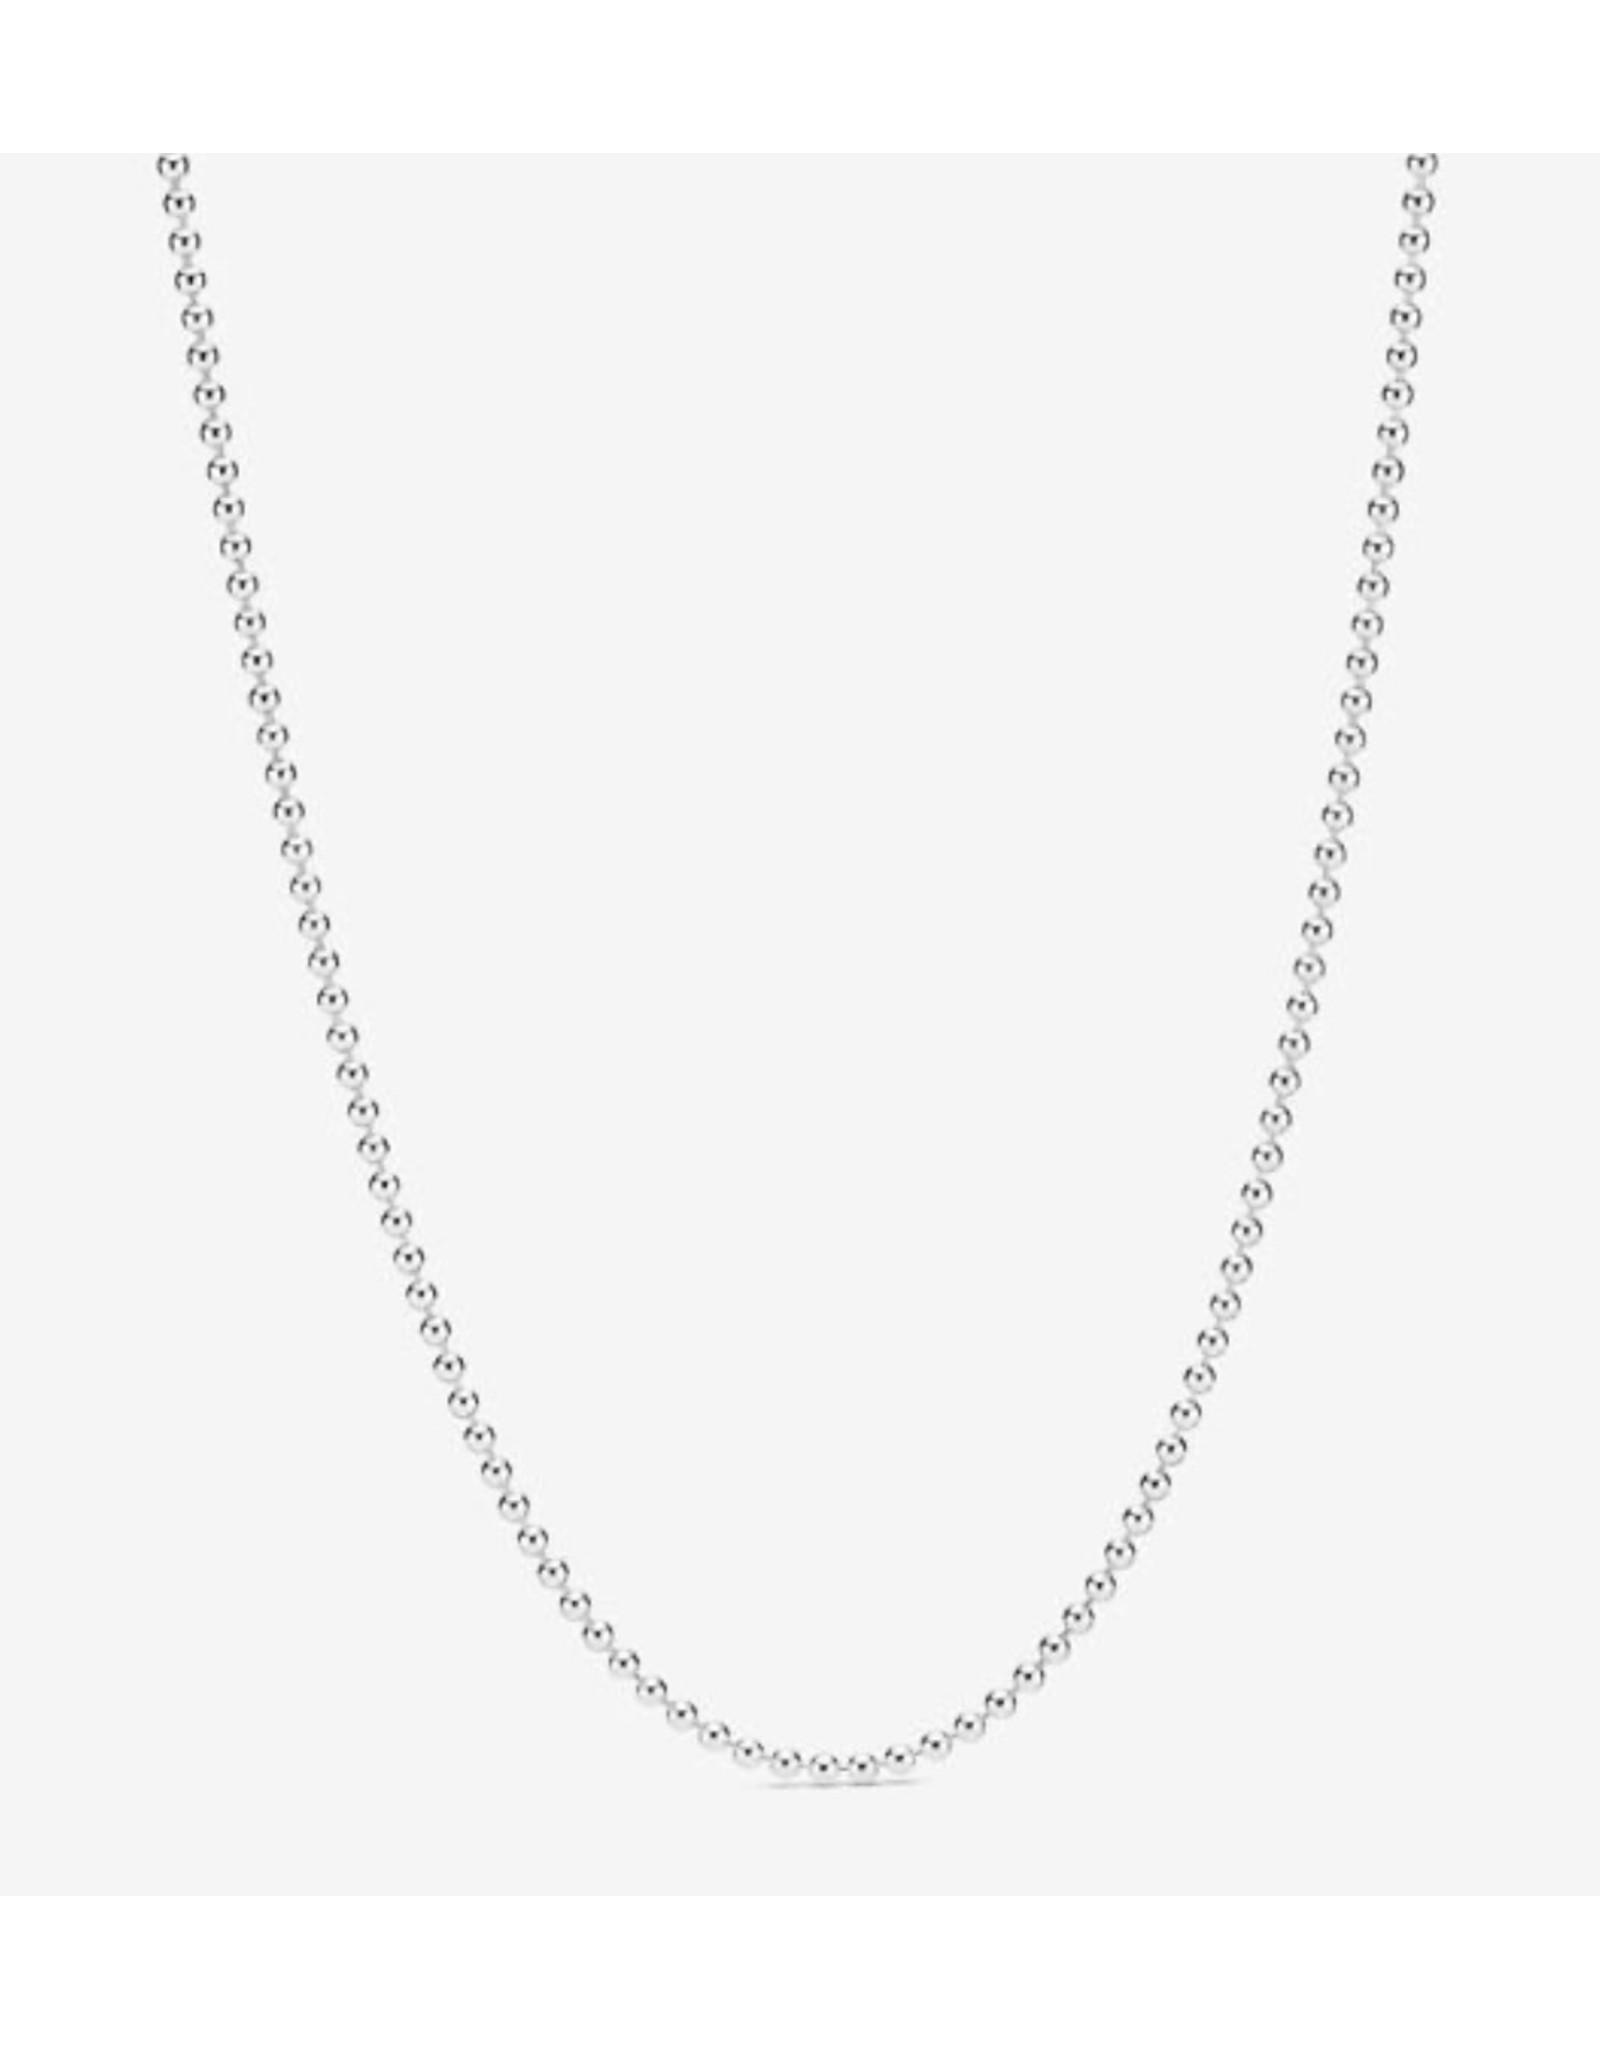 Pandora Necklace For Men : pandora, necklace, Pandora, Necklace,399104C00-60,, Polished, Chain,, Sterling, Silver, Monde